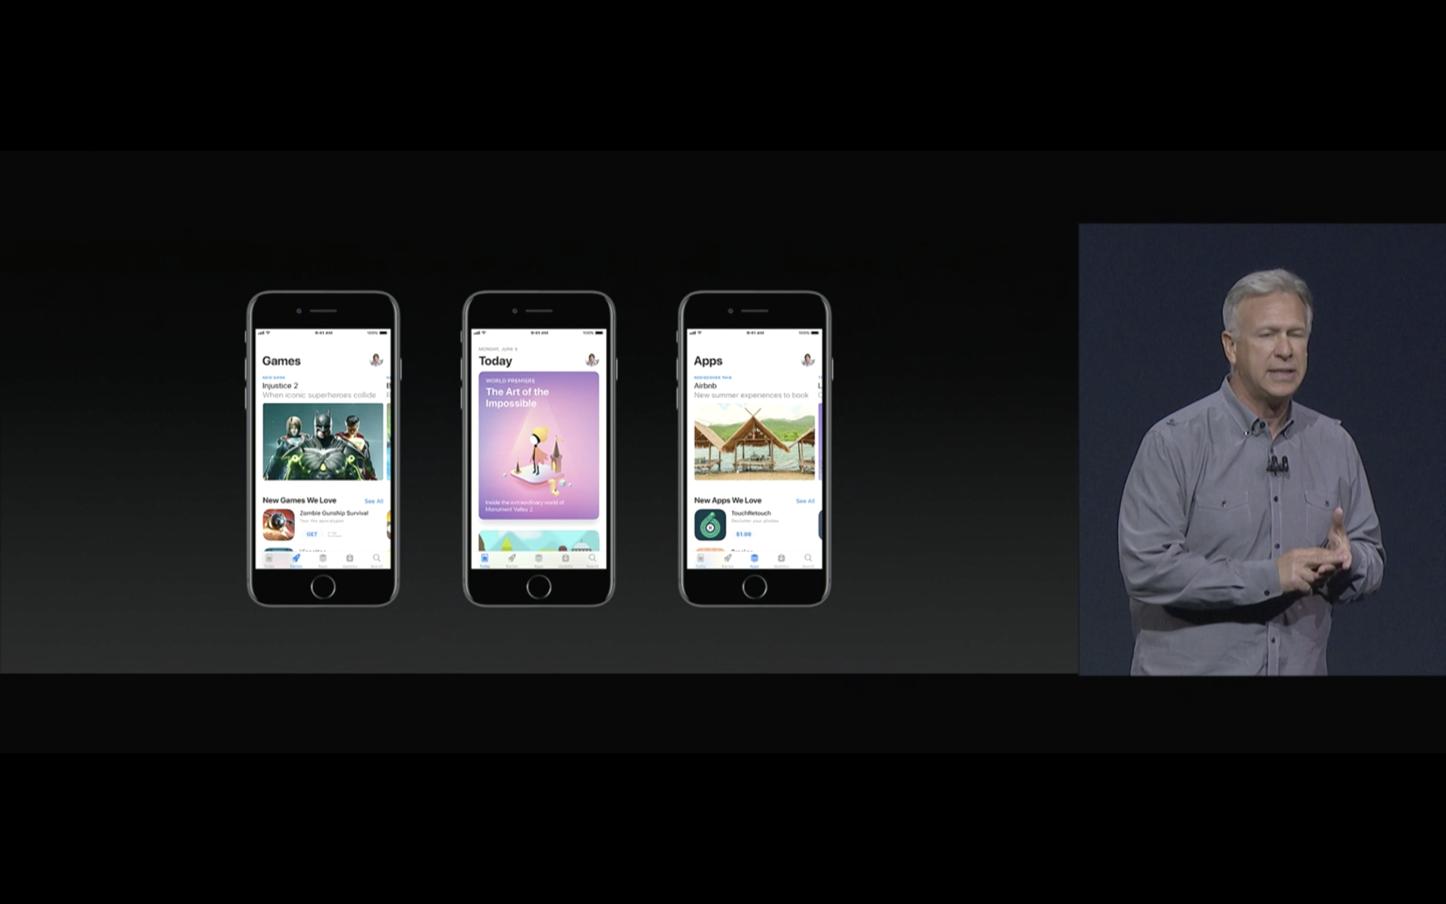 iOS11-2017-WWDC17-79.png